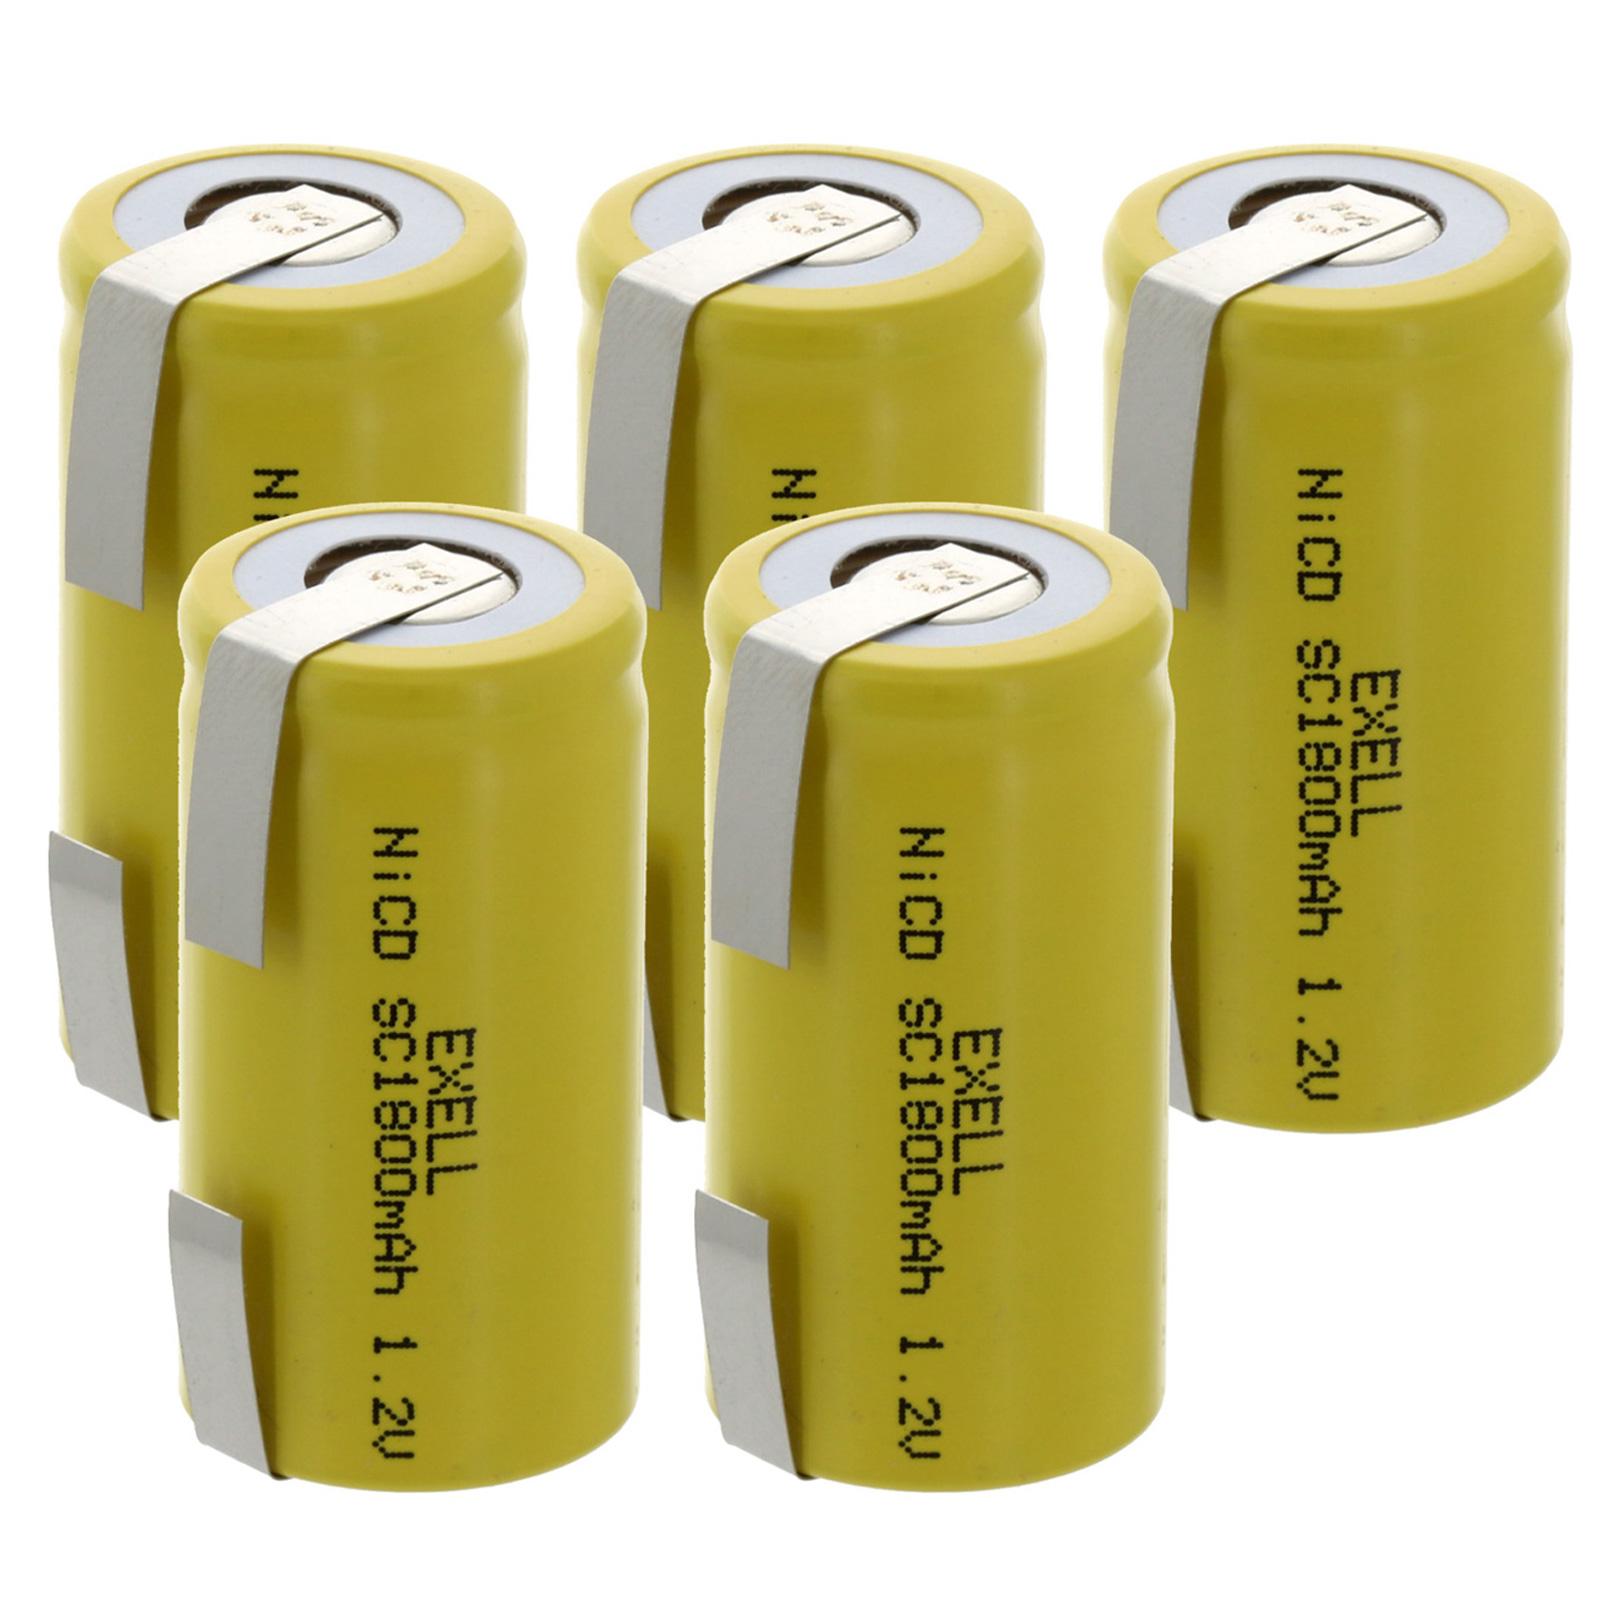 2pc 1.2V SubC 1800mAh NiCD Rechargeable High Temp Flat Top Batteries USA SHIP